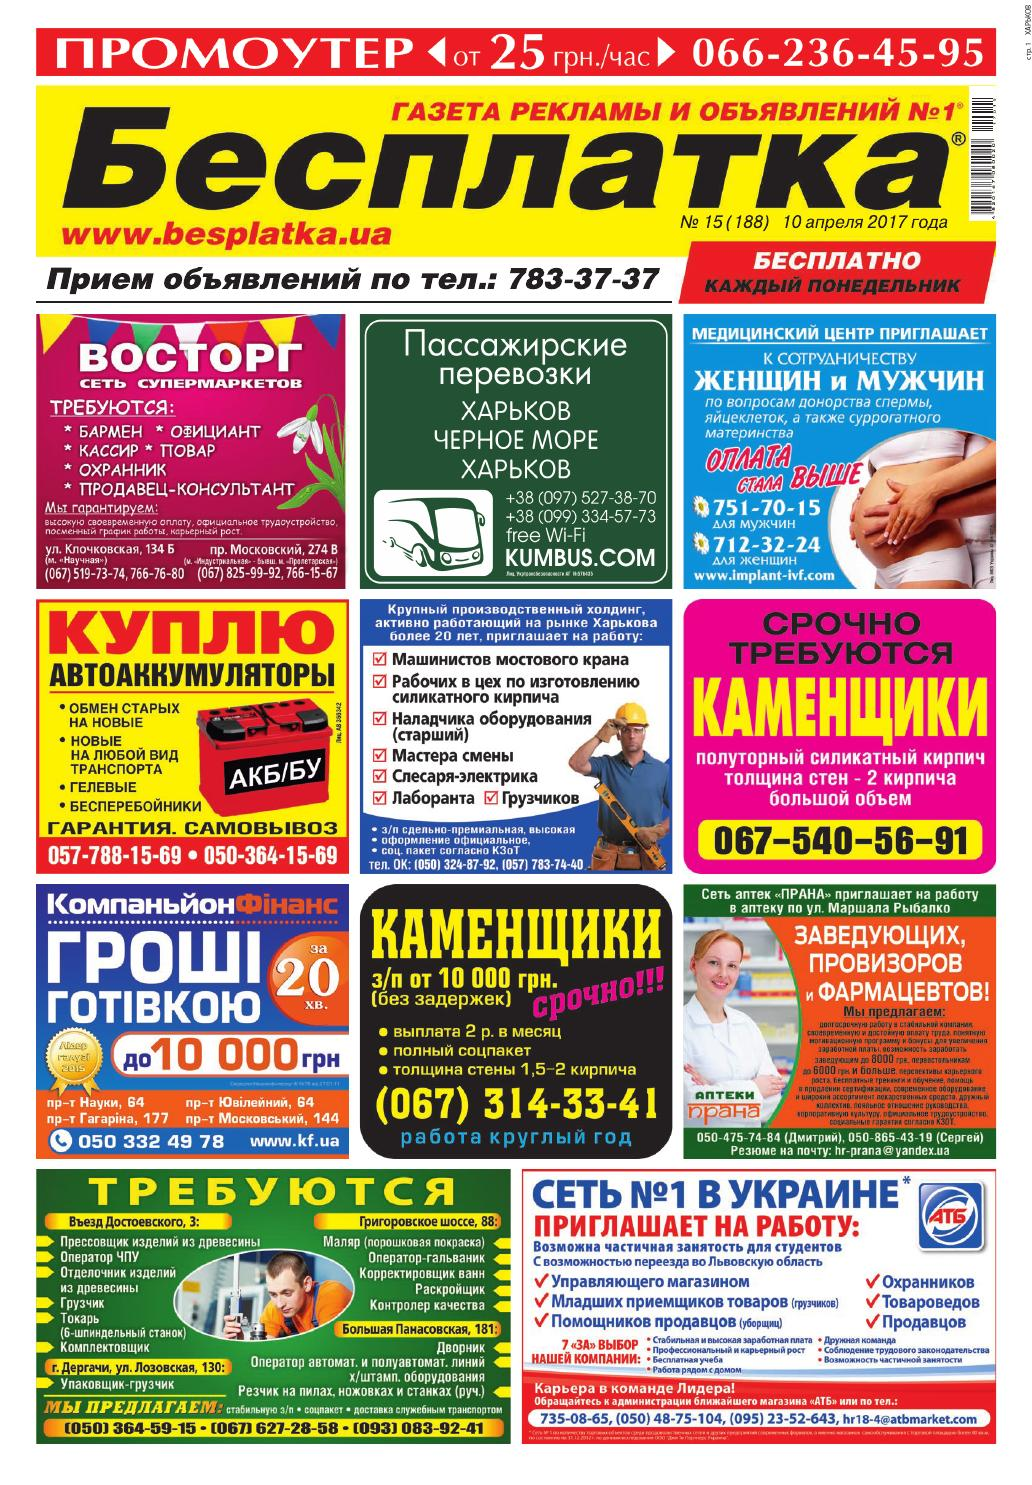 Besplatka  15 Харьков by besplatka ukraine - issuu 92f418597b5